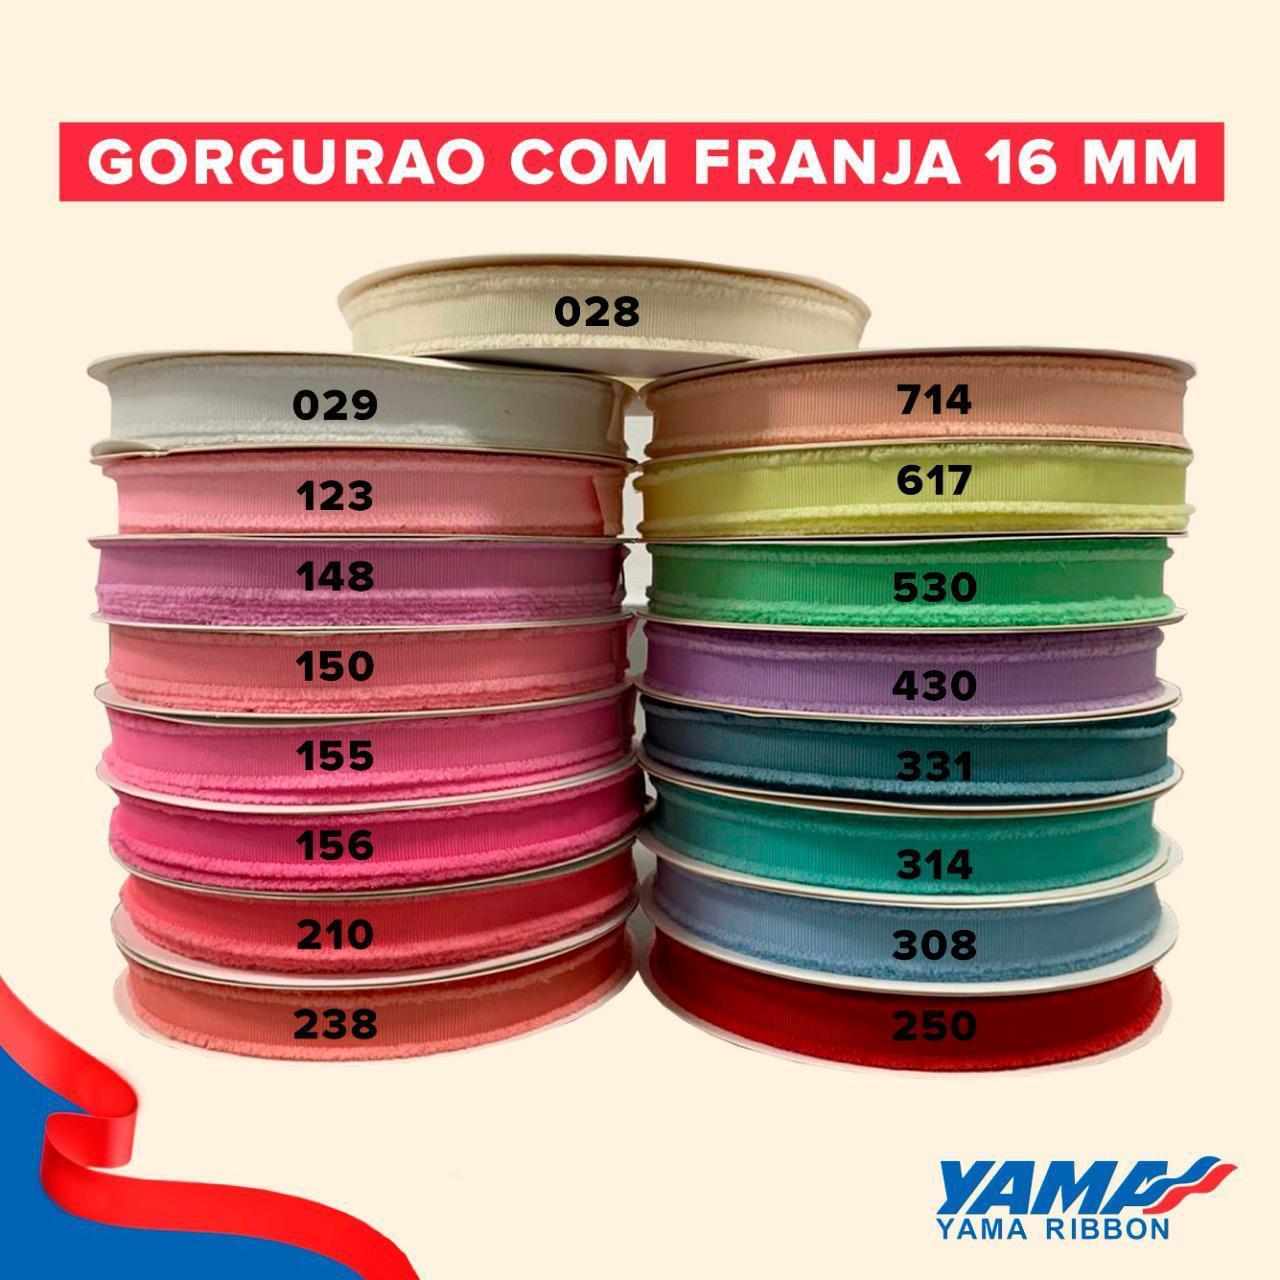 FITAS YAMA 16MM FRANJINHAS - 3 METROS